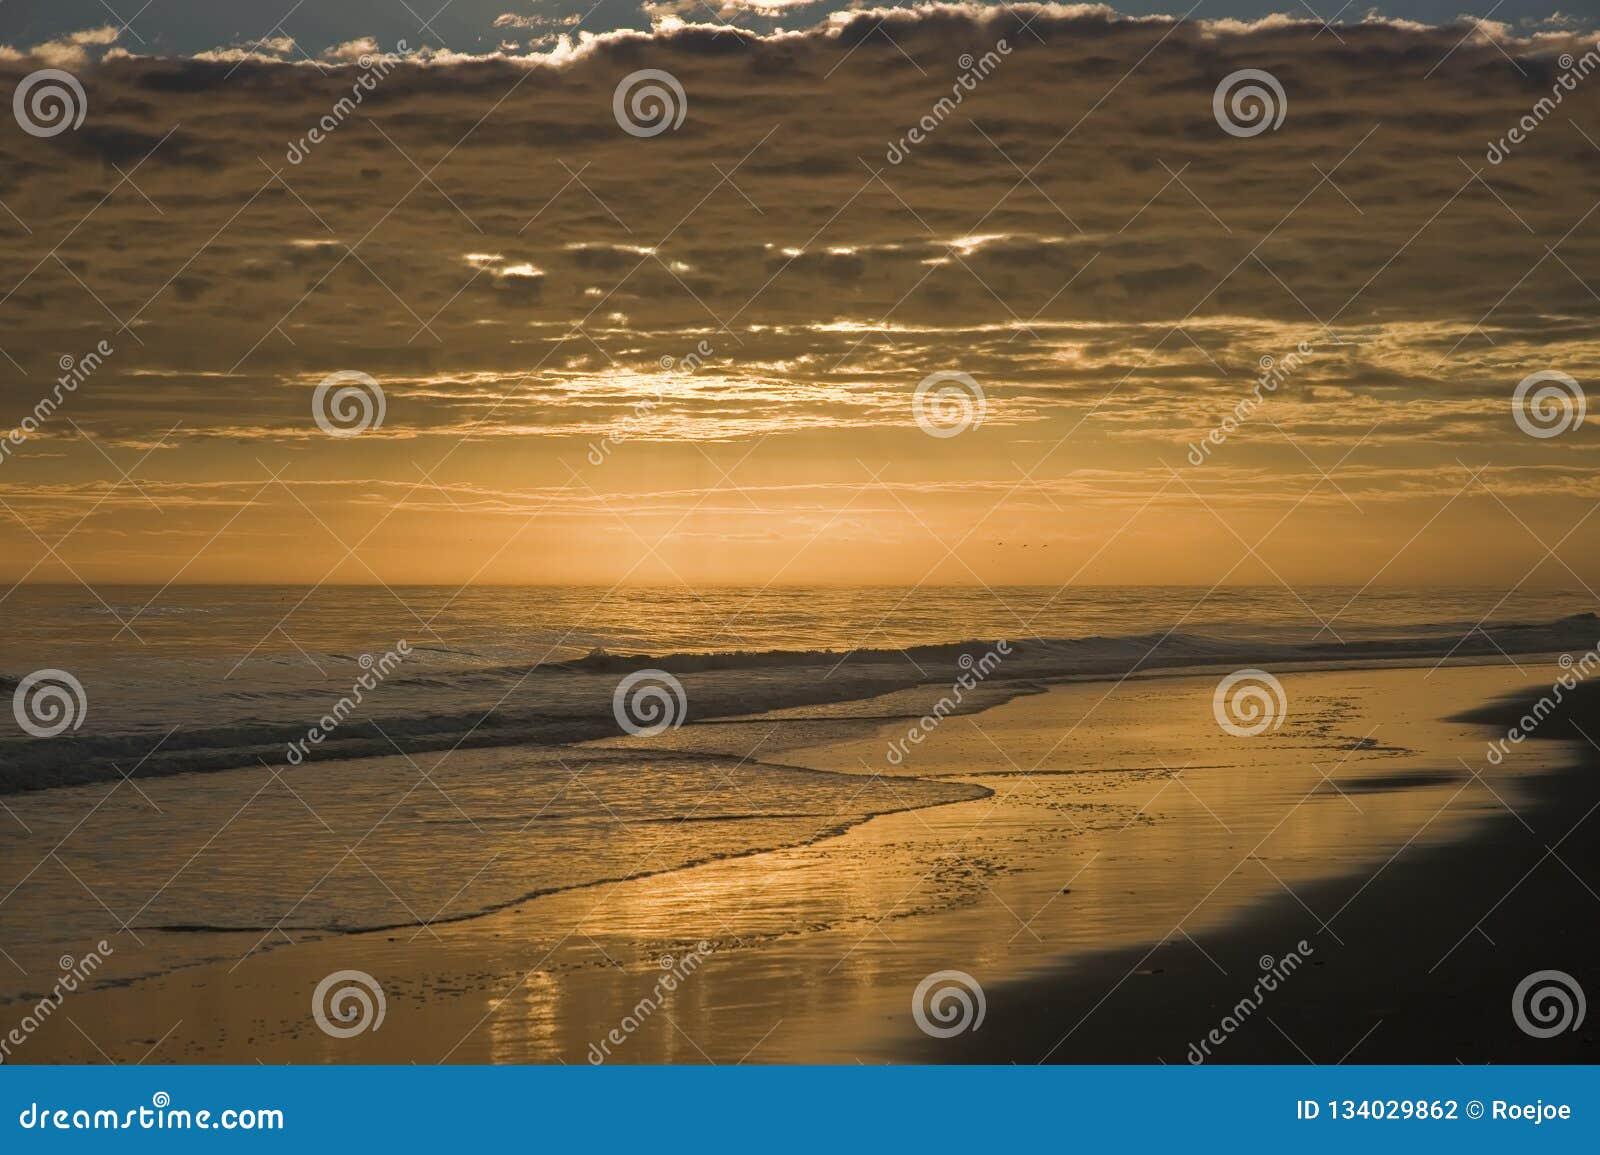 Beach at Outer Banks at sunset